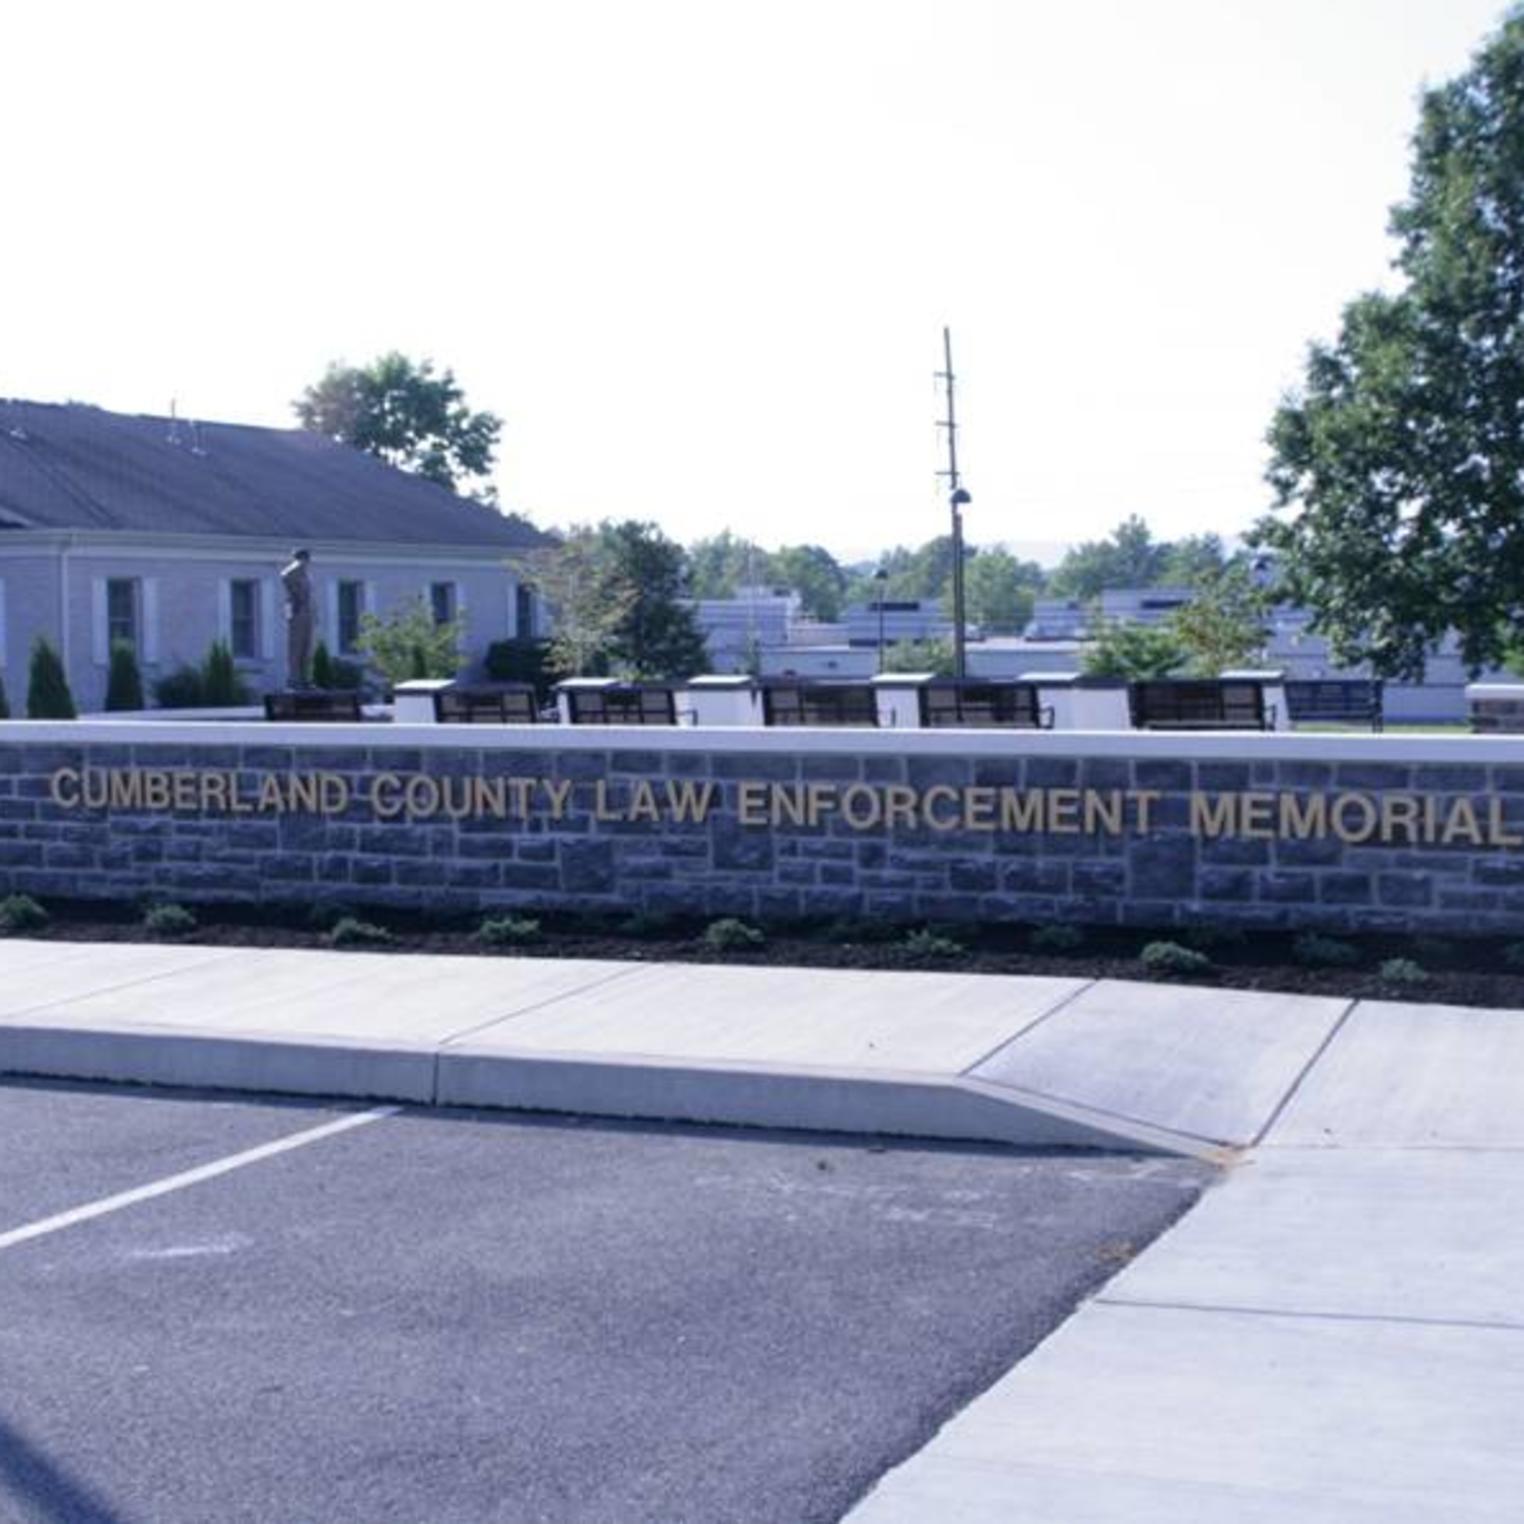 Cumberland County Law Enforcement Memorial